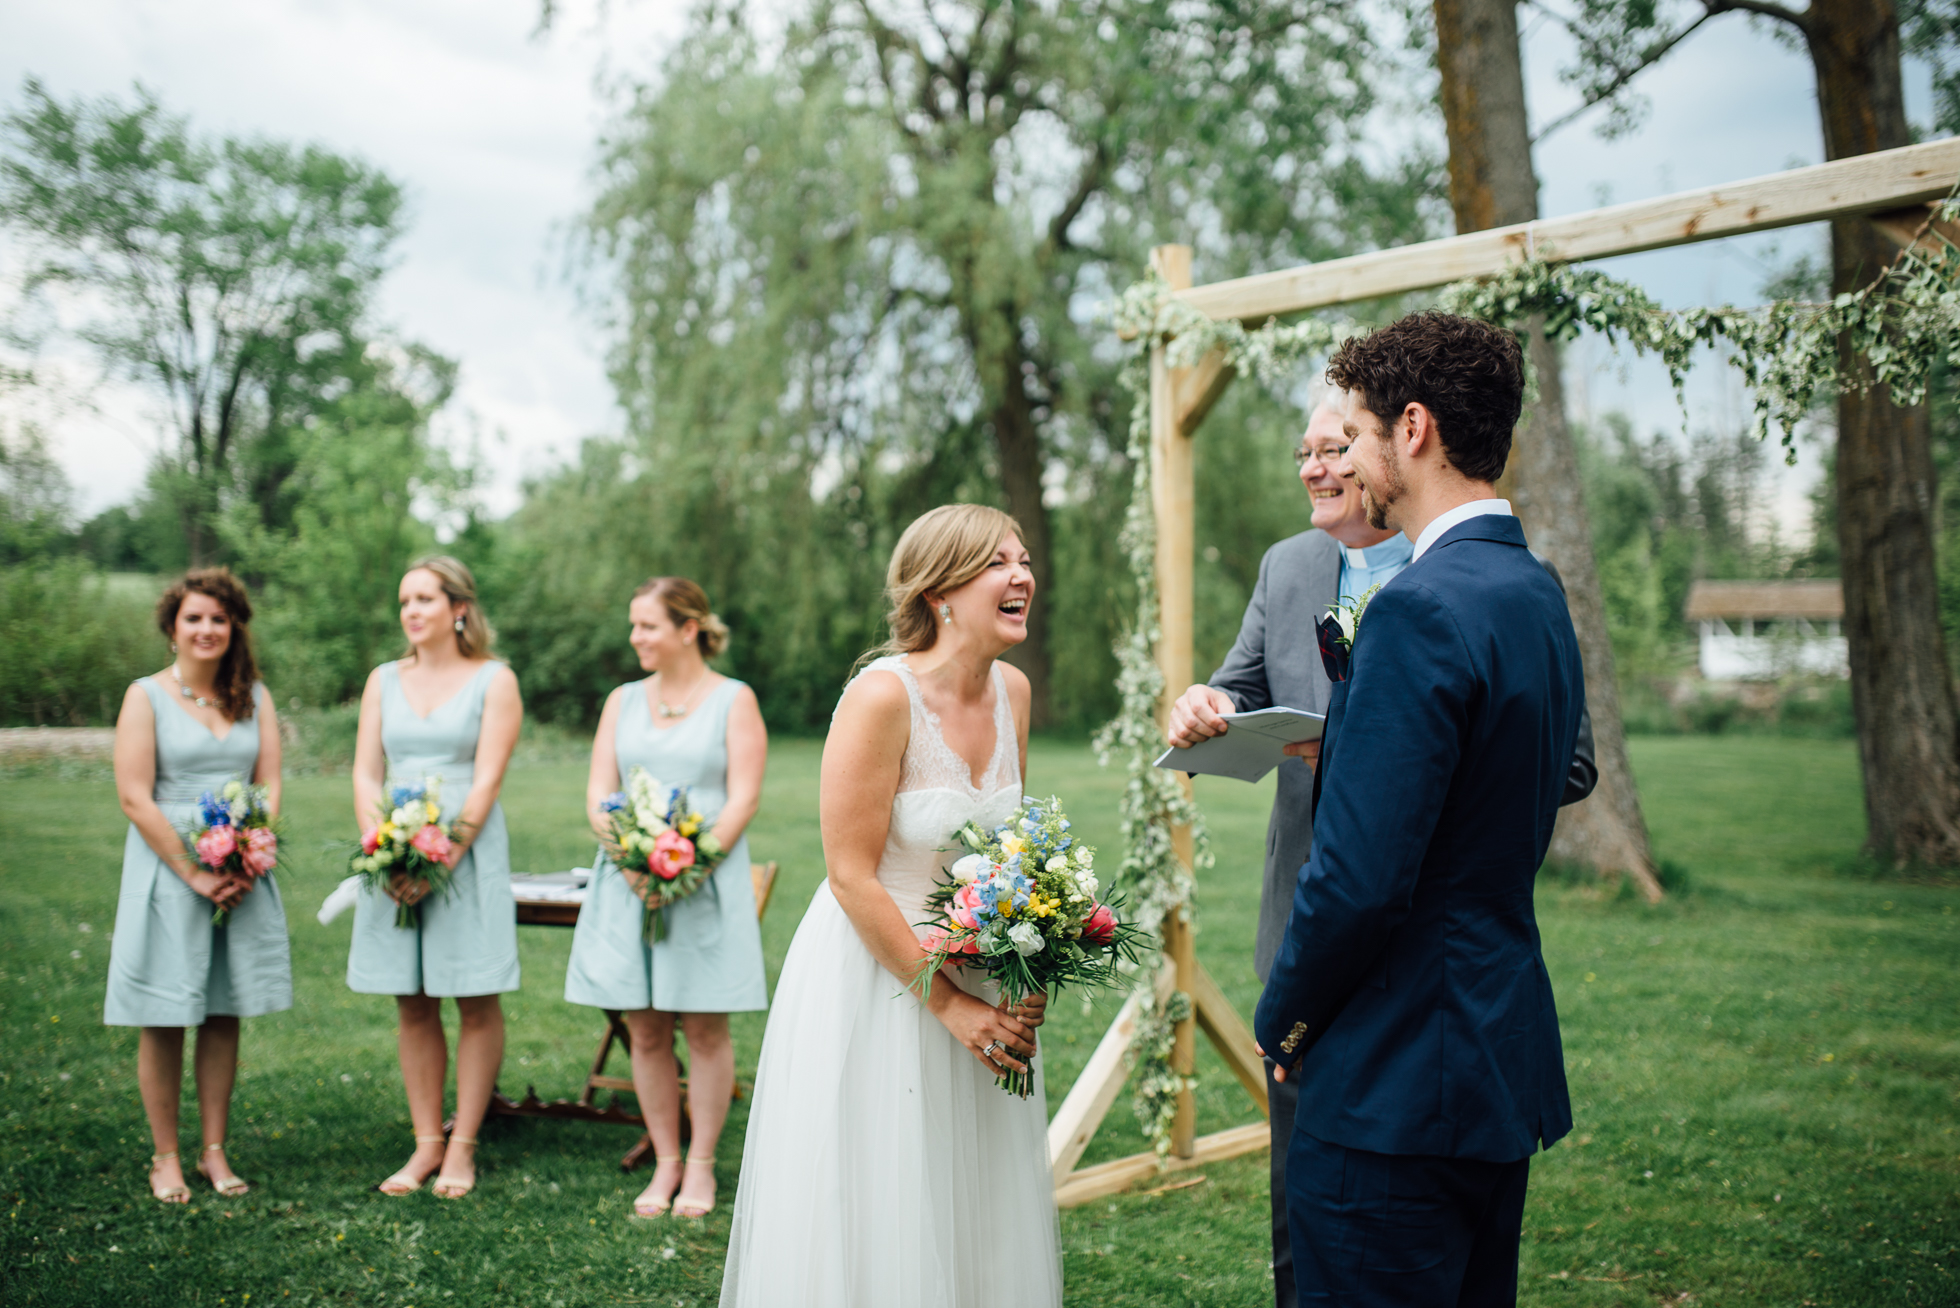 Outdoor wedding ceremony at Tralee in Caledon - Sara Monika, Photographer